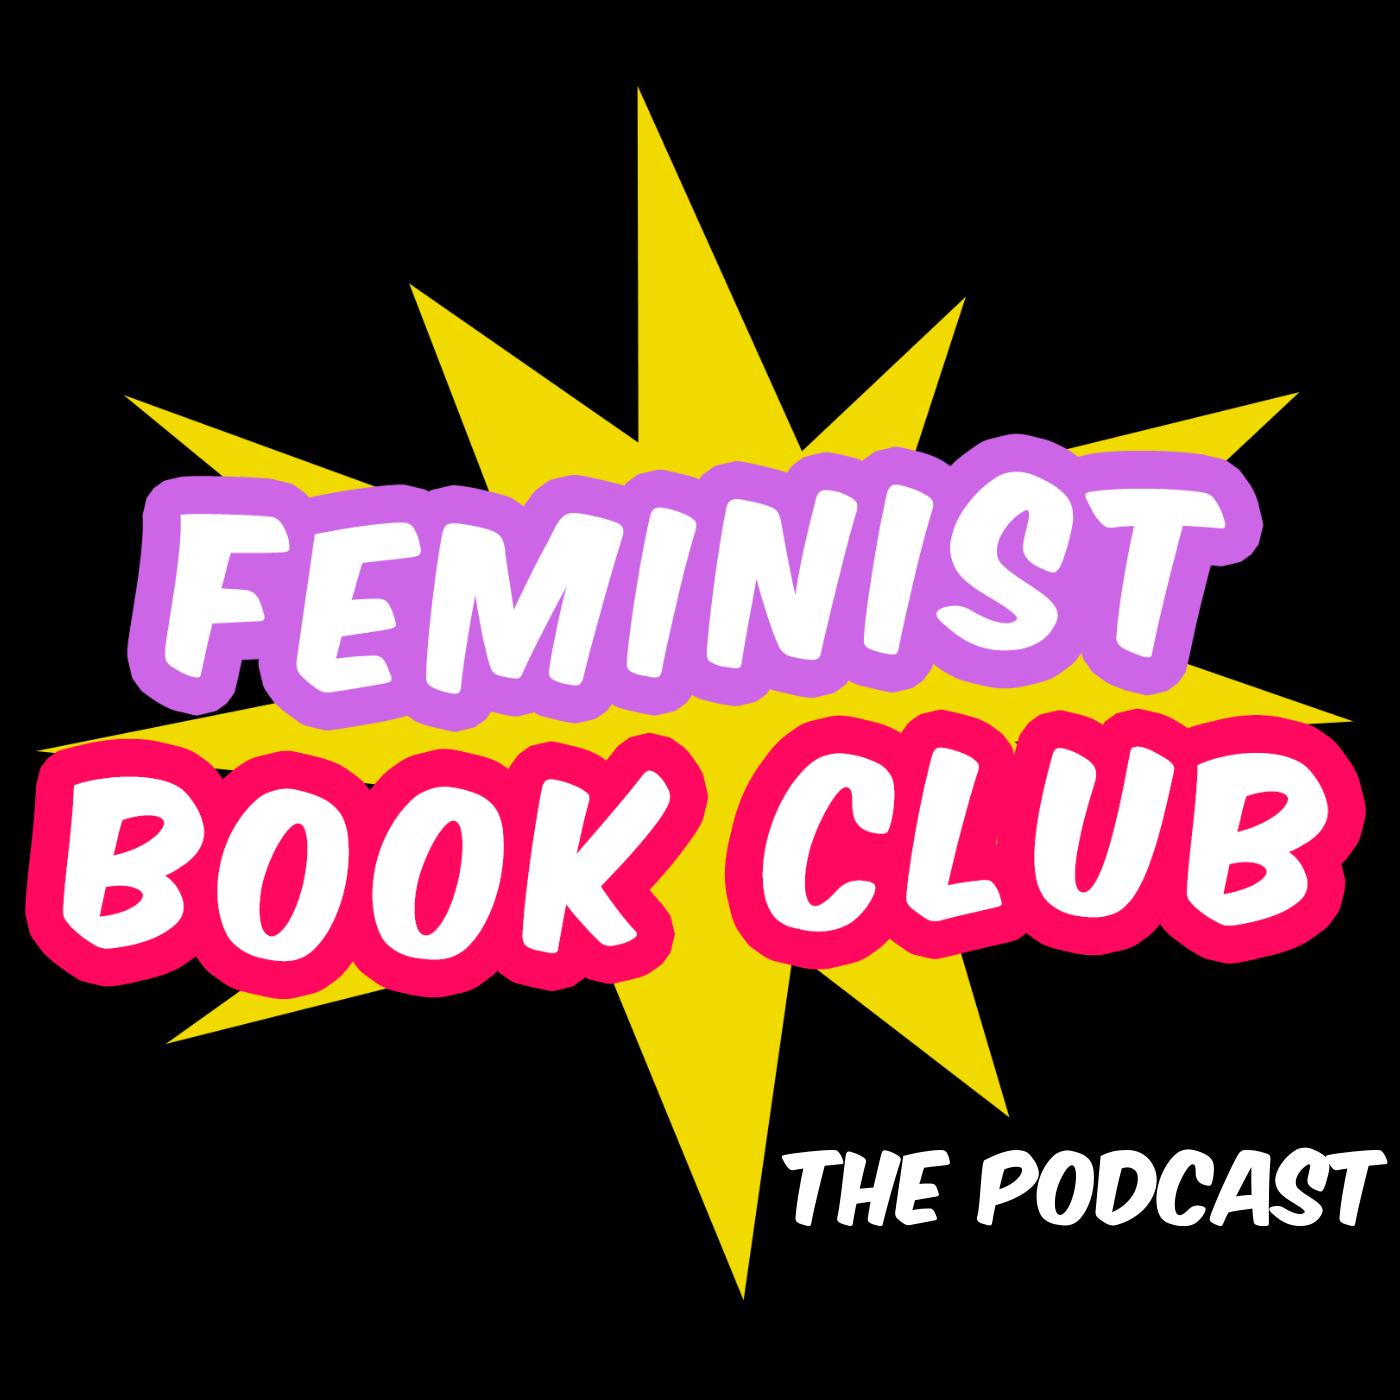 Feminist Book Club: The Podcast show art